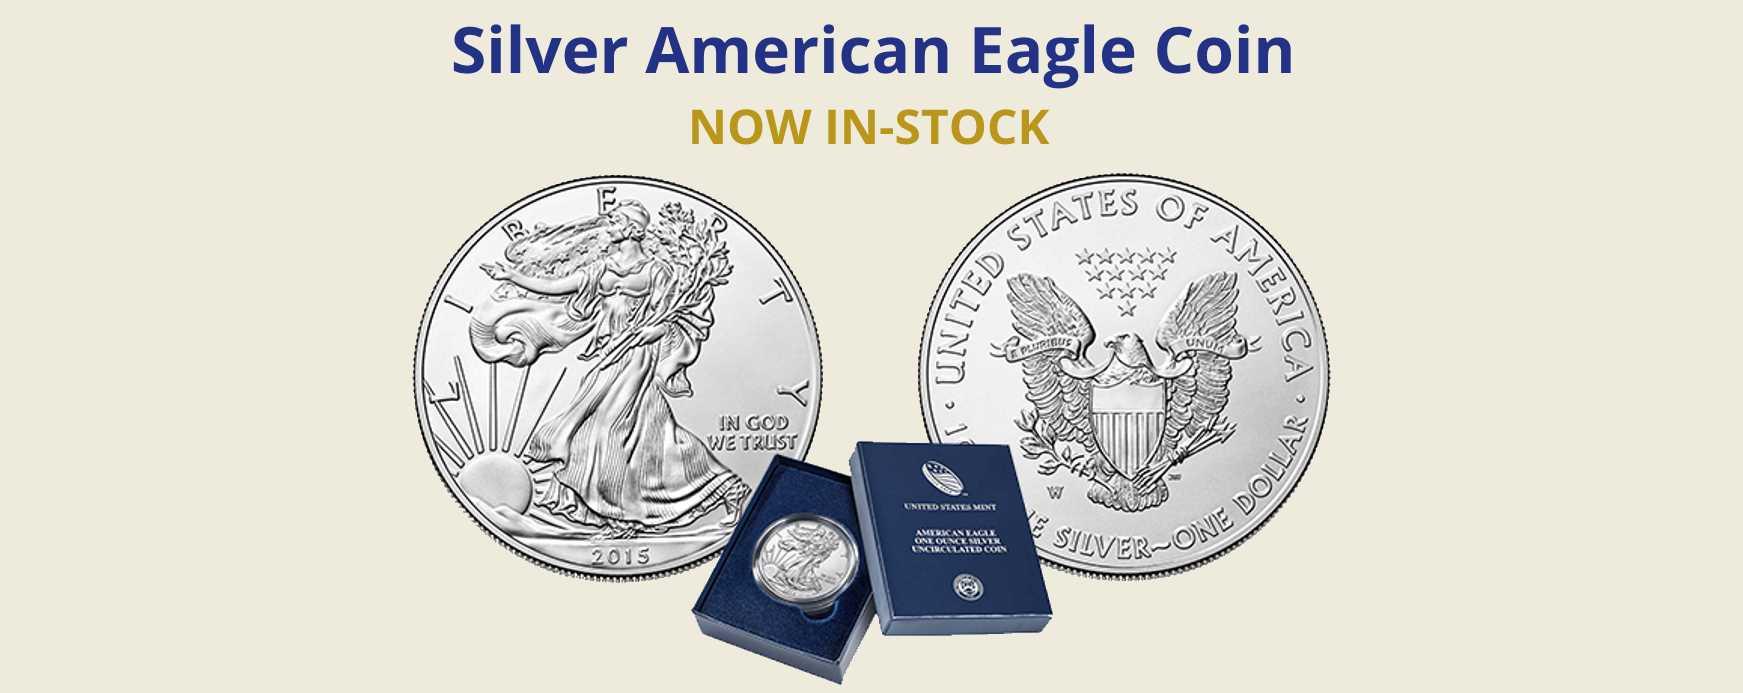 Silver American Eagles